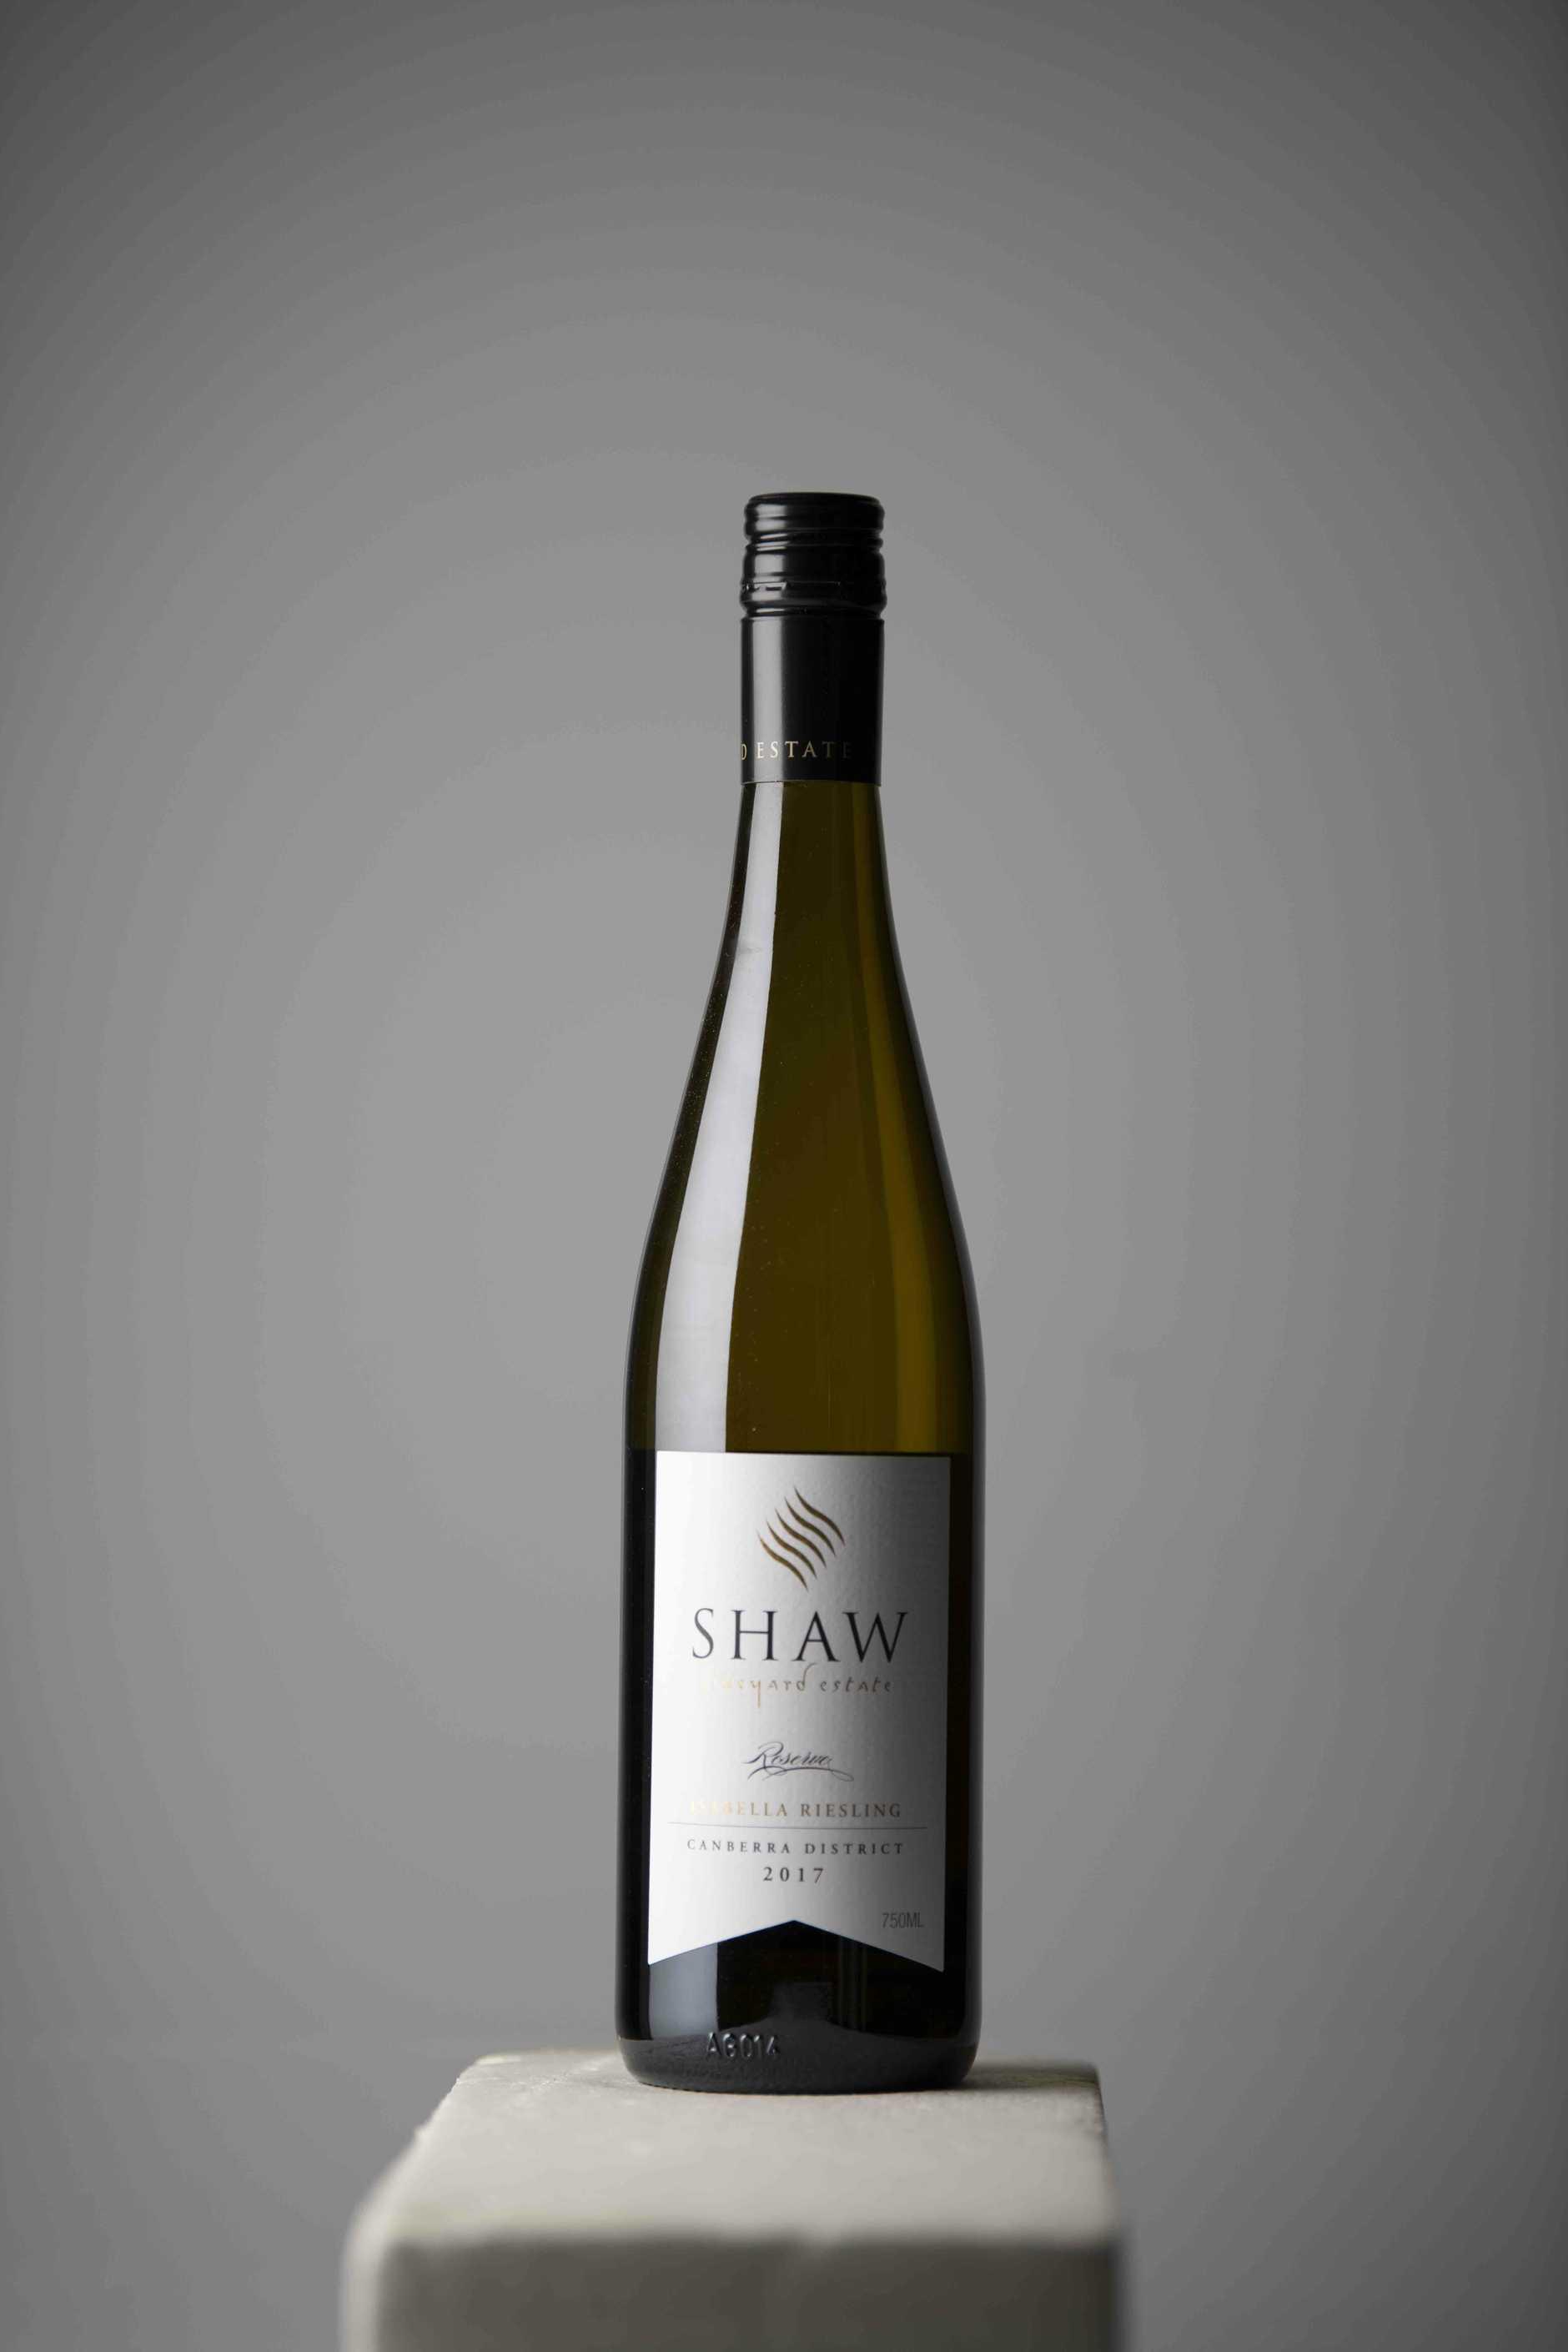 Shaw Vineyard Estate Canberra District Reserve Isabella Riesling 2017